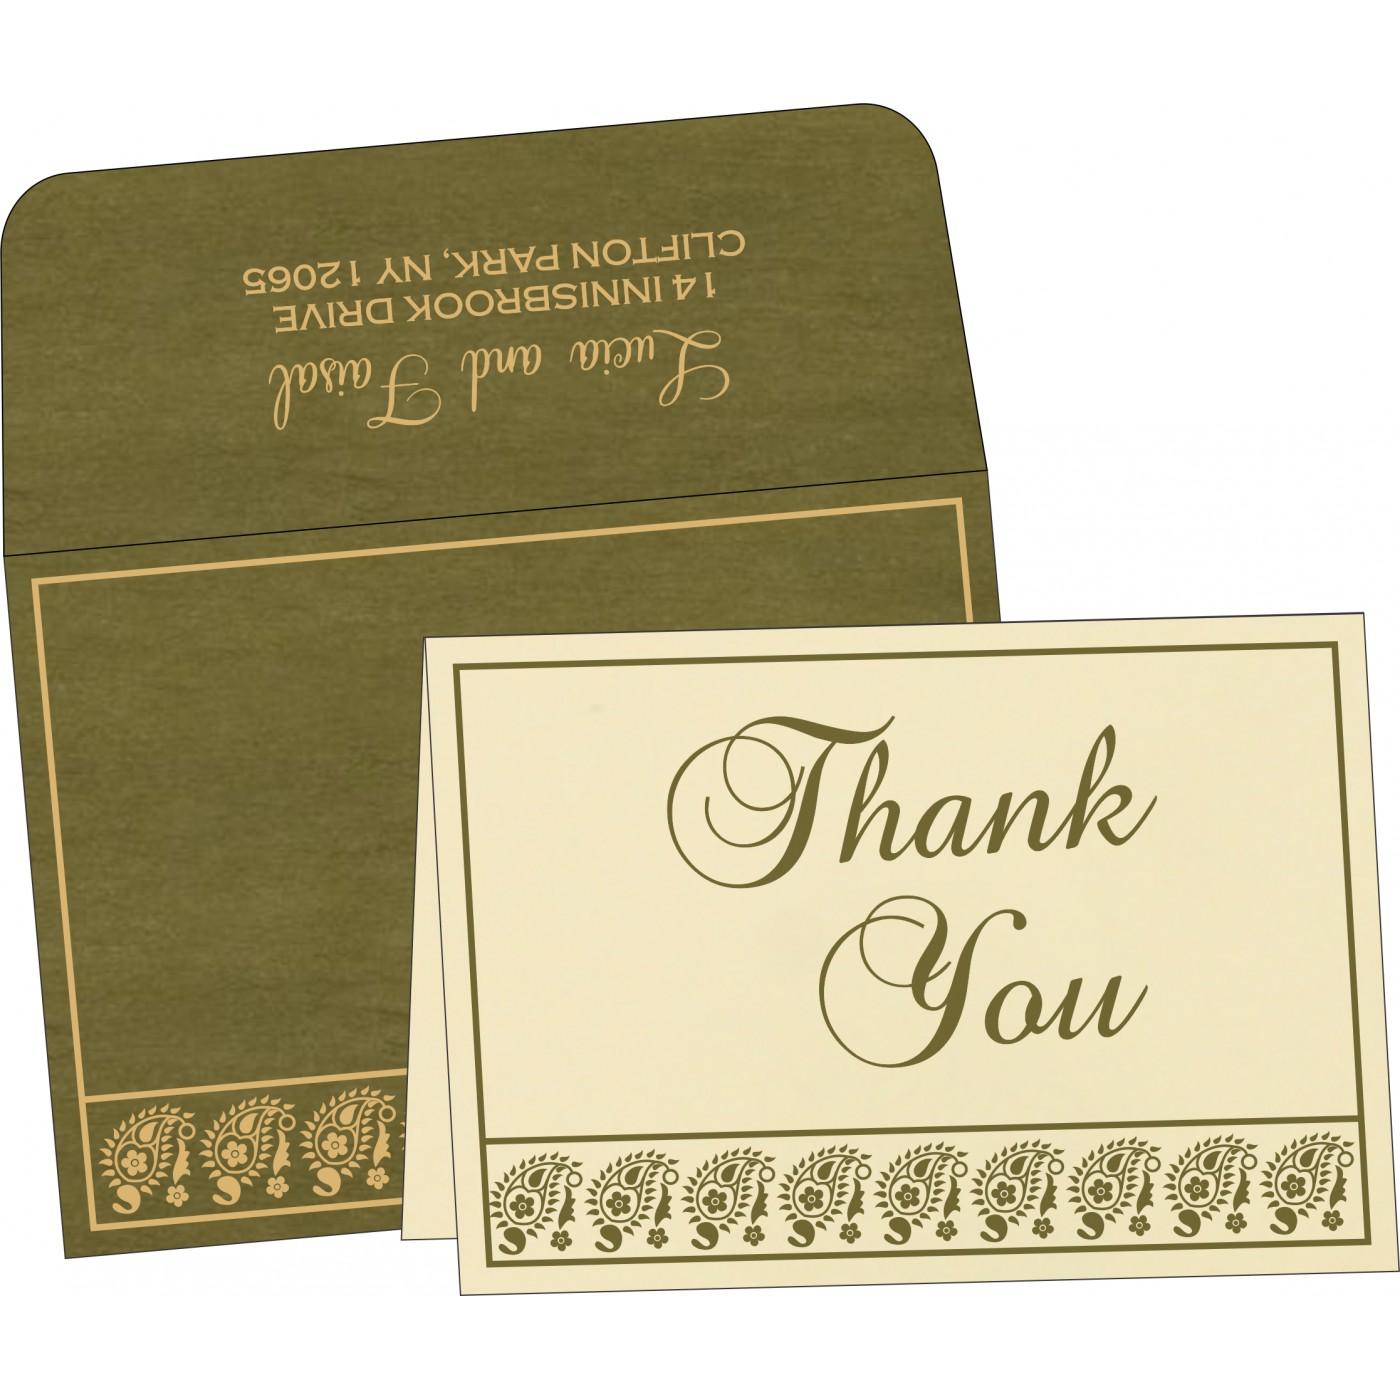 Thank You Cards : TYC-8218A - 123WeddingCards